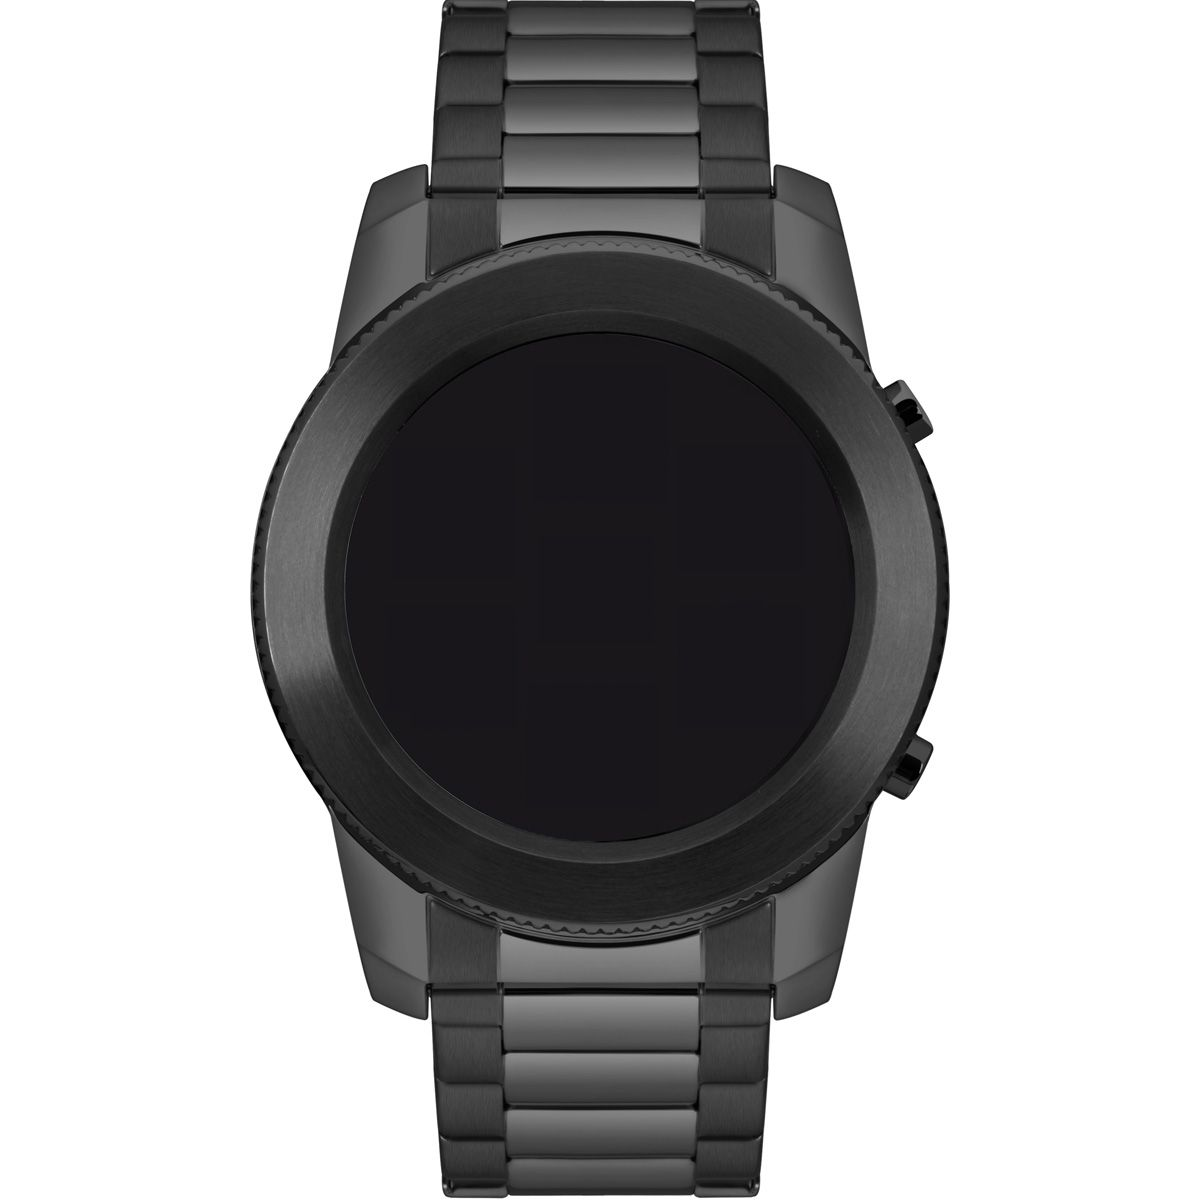 ... Relógio Masculino Technos Connect Smartwatch M1AB 4P Aço Preto -  Vitrino Relógios 31ba958083